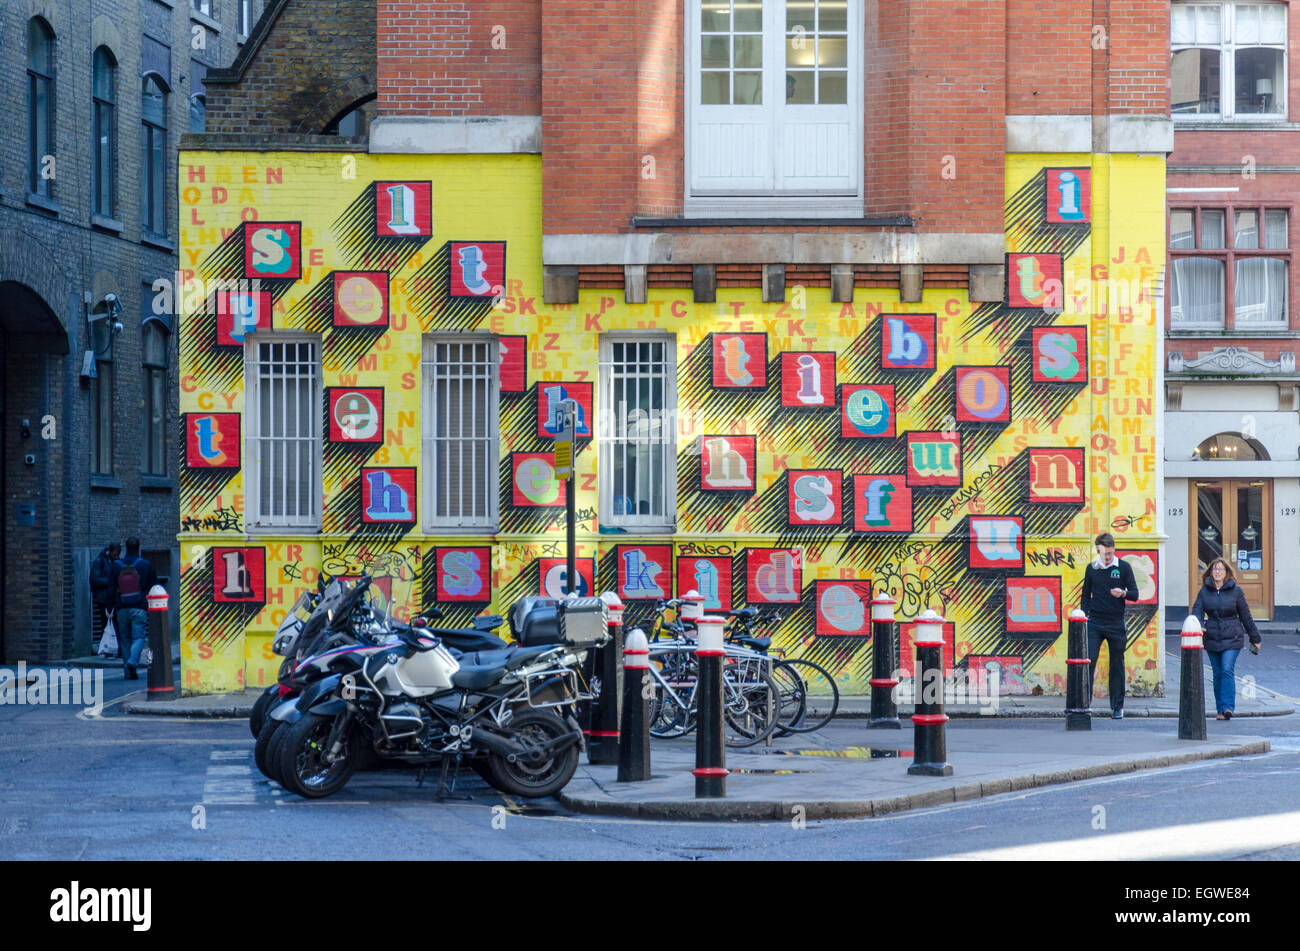 east london street art map rome - photo#16